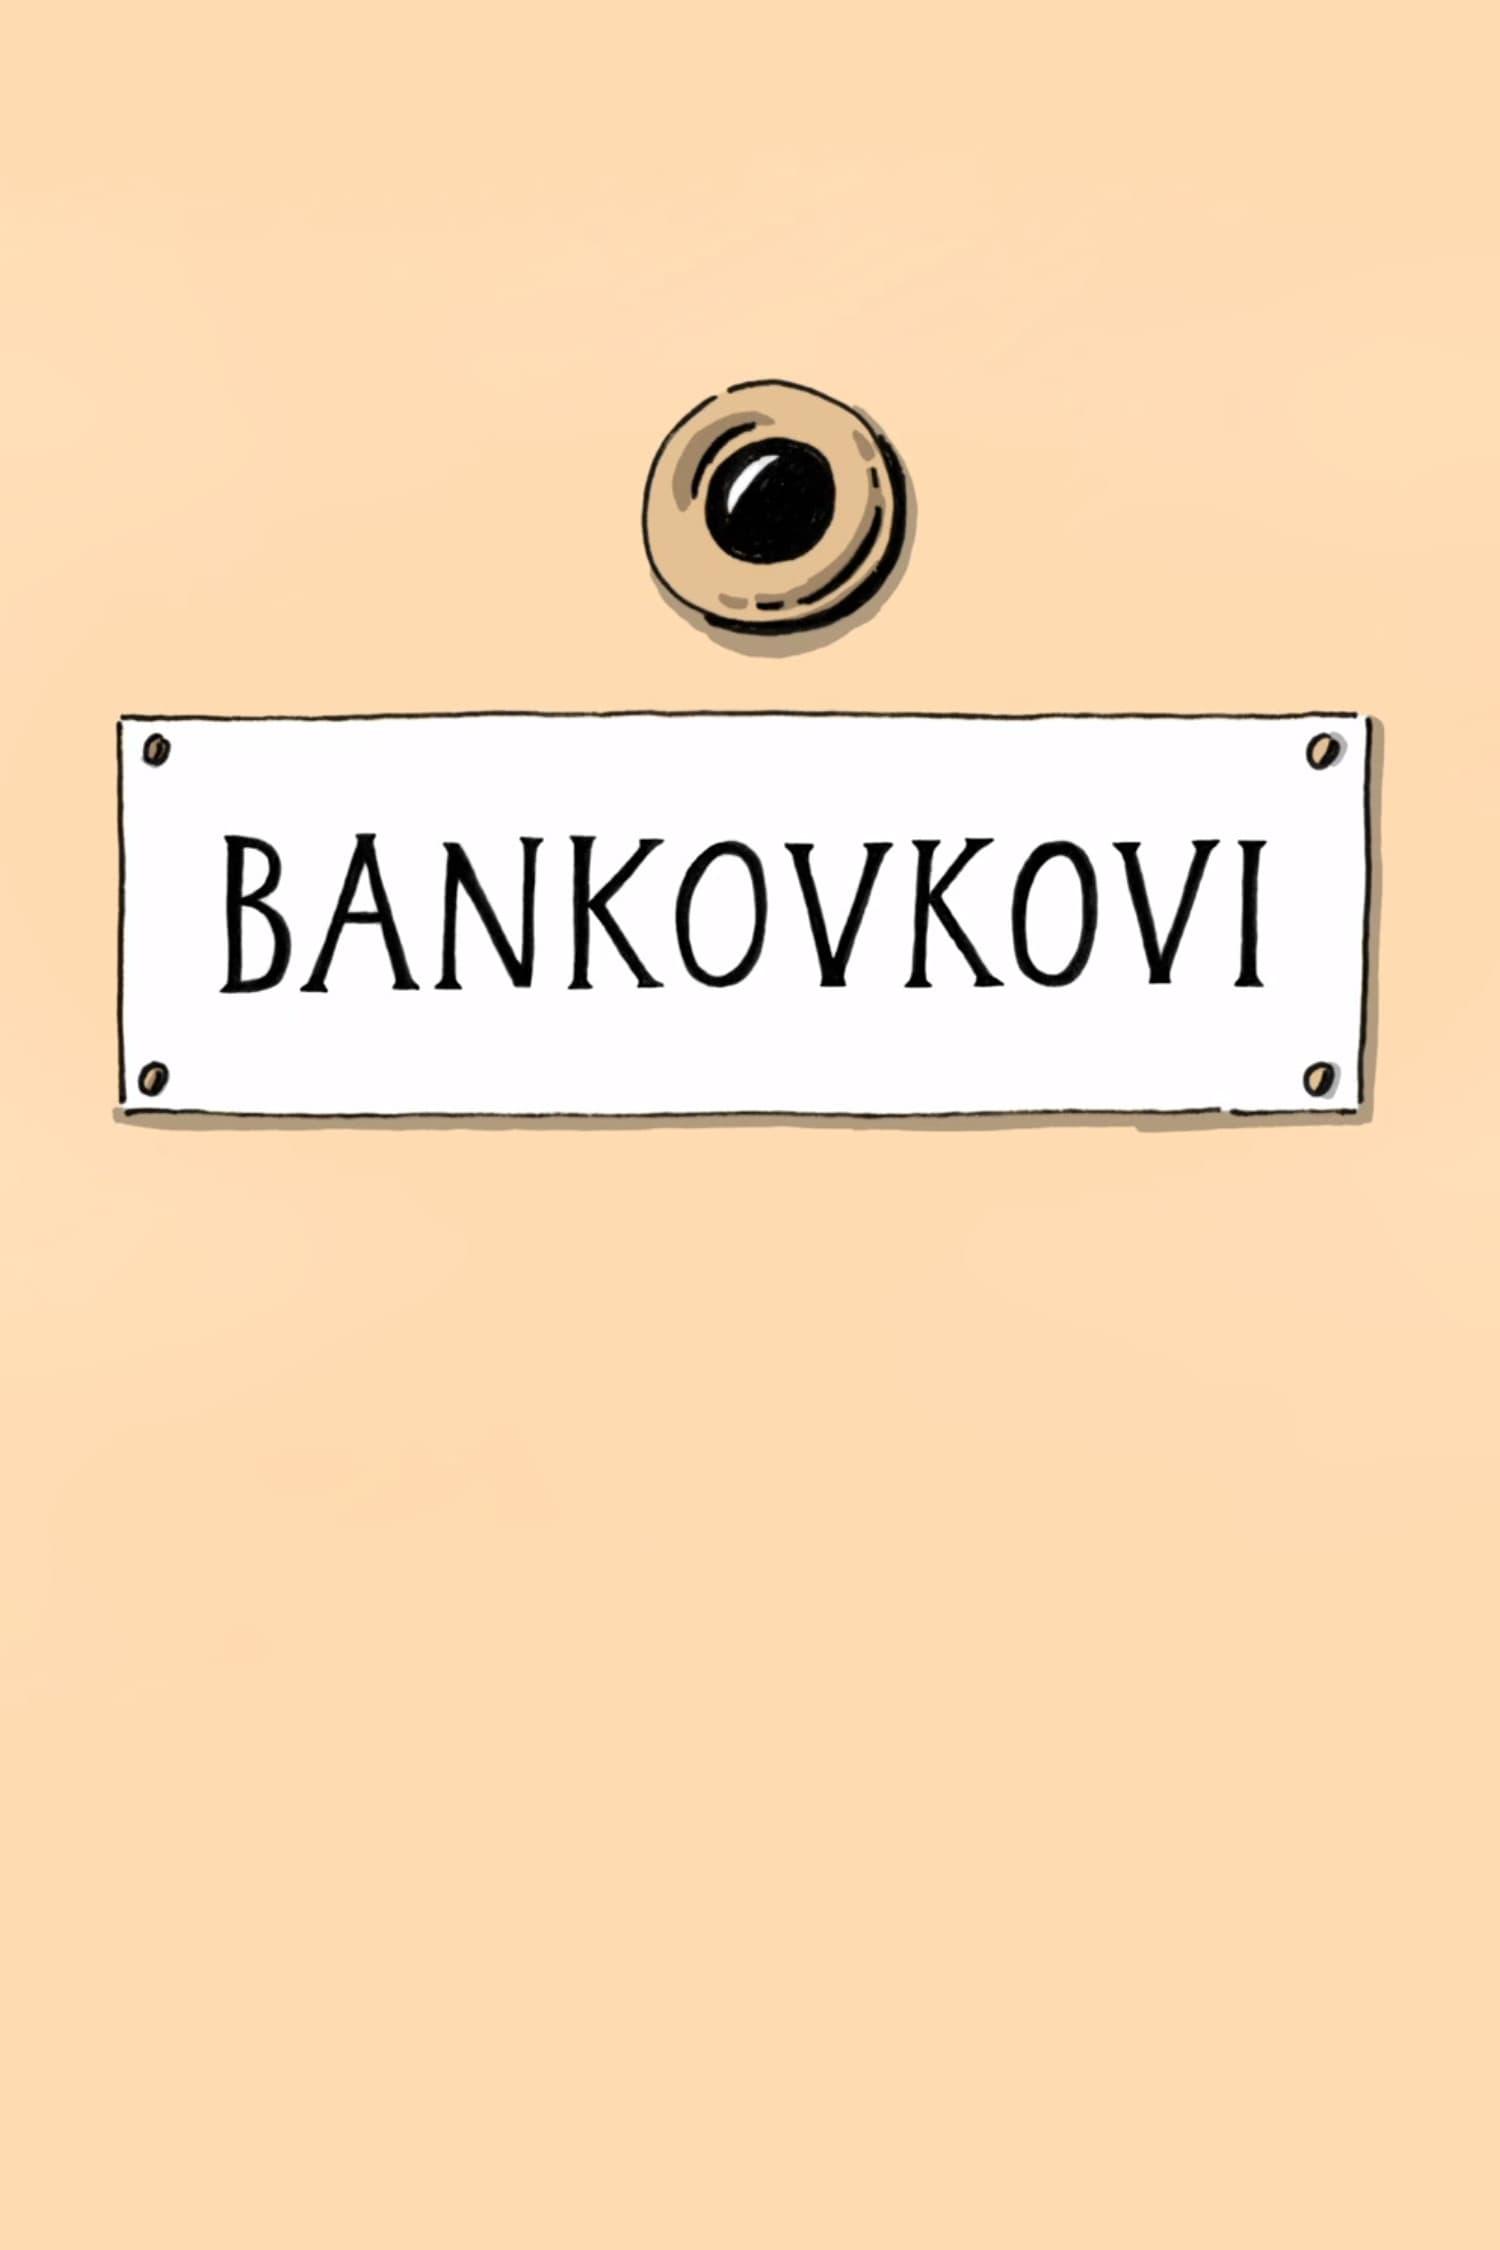 Bankovkovi TV Shows About Educational